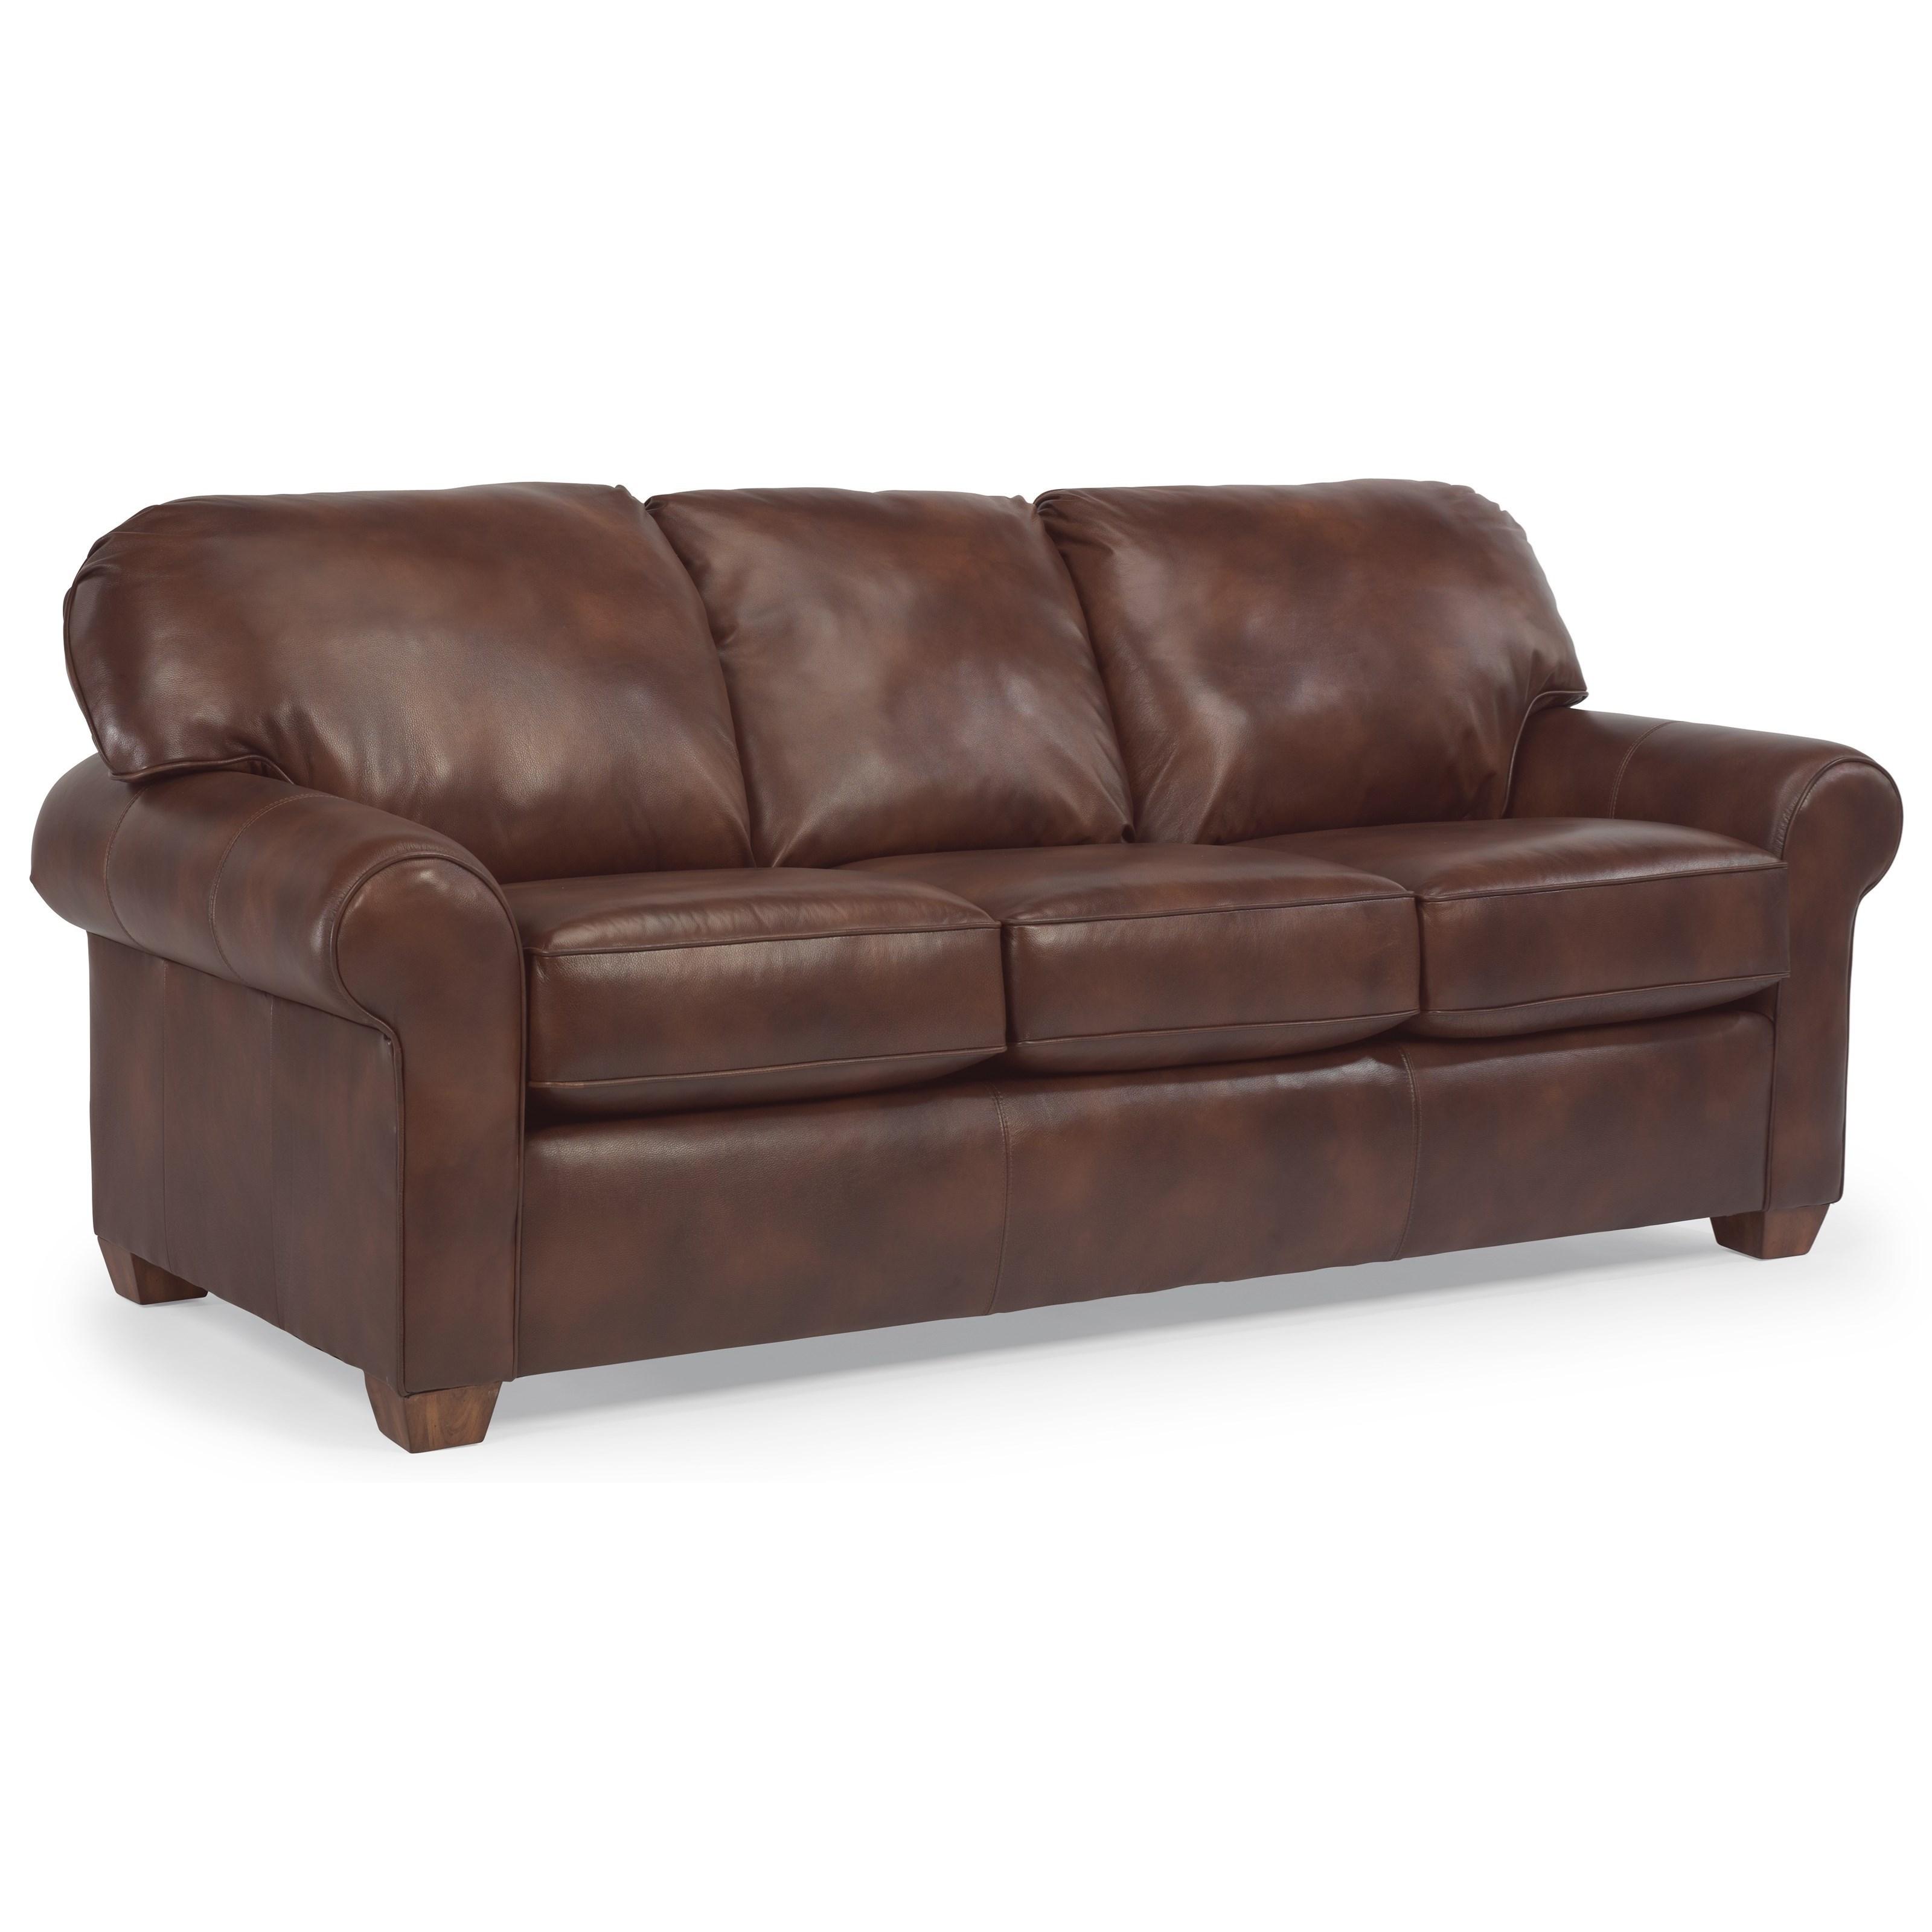 Astonishing Sleeper Recliner Brookerpalmtrees Dailytribune Chair Design For Home Dailytribuneorg